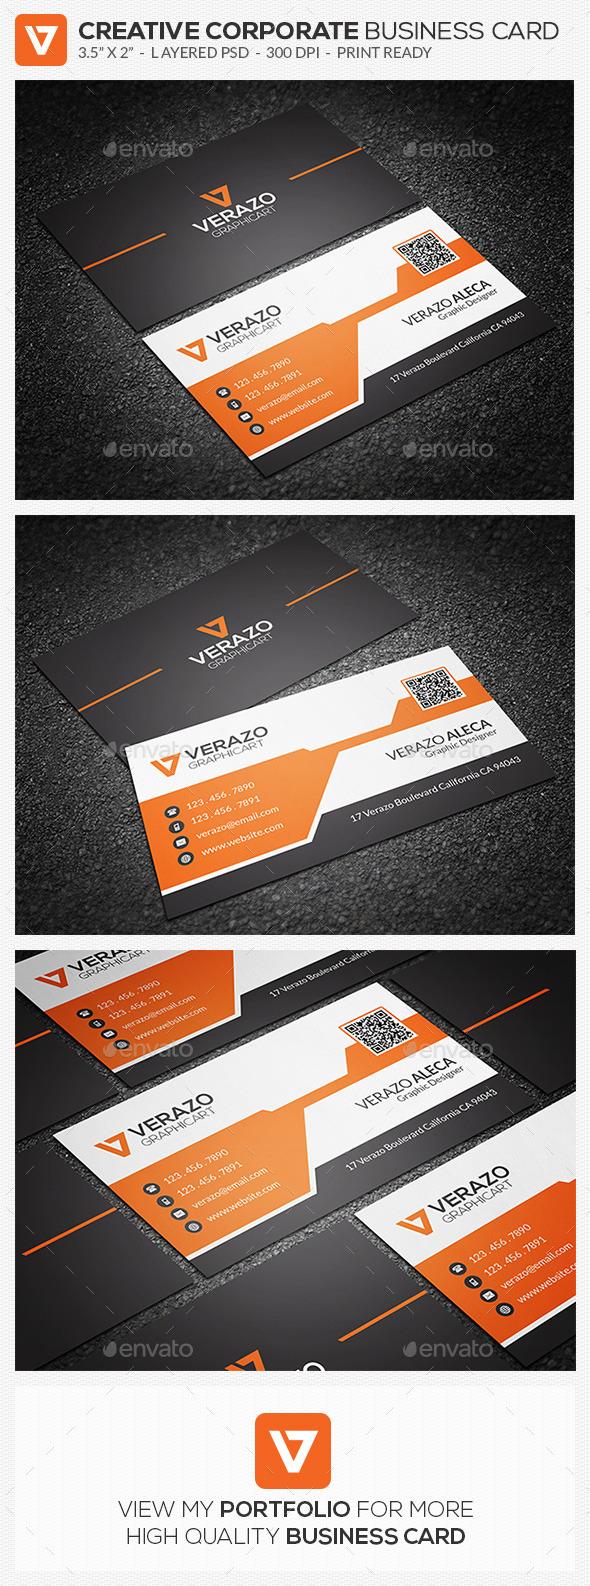 Creative Corporate Business Card 70 - Corporate Business Cards